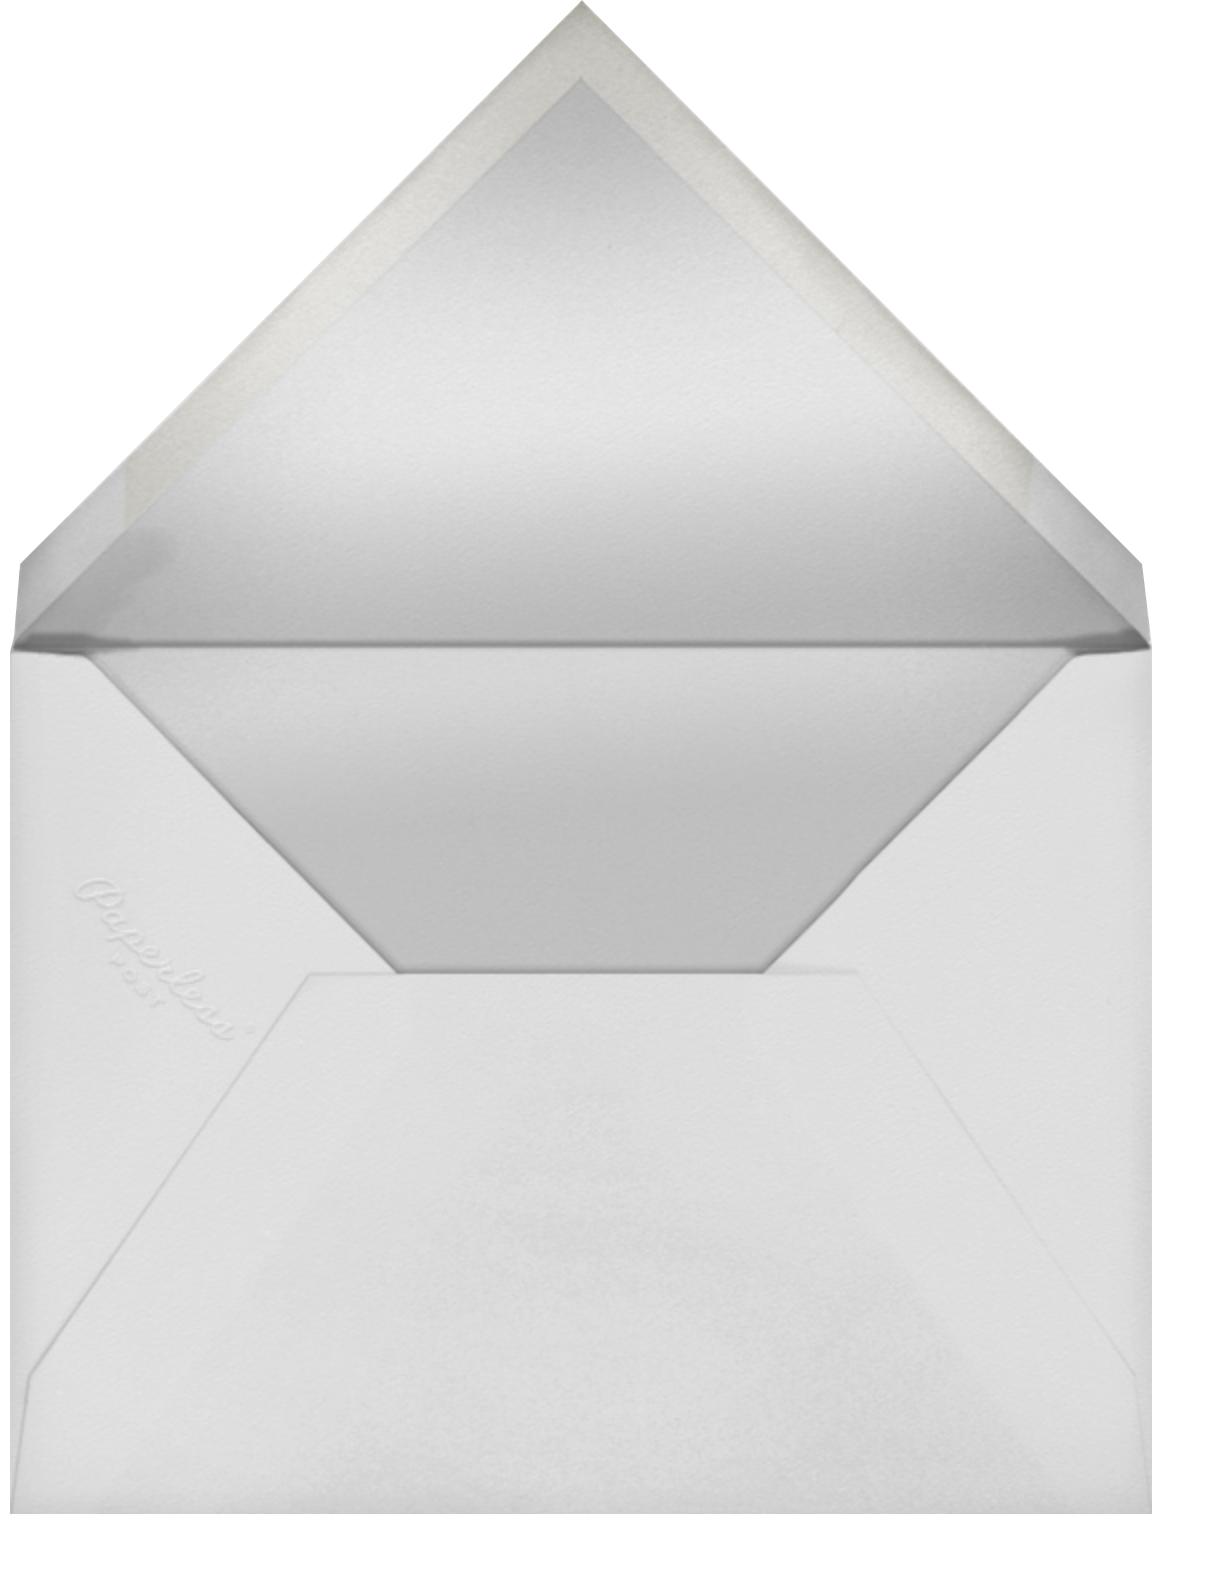 Ikebana (Menu) - Red - Paperless Post - Envelope